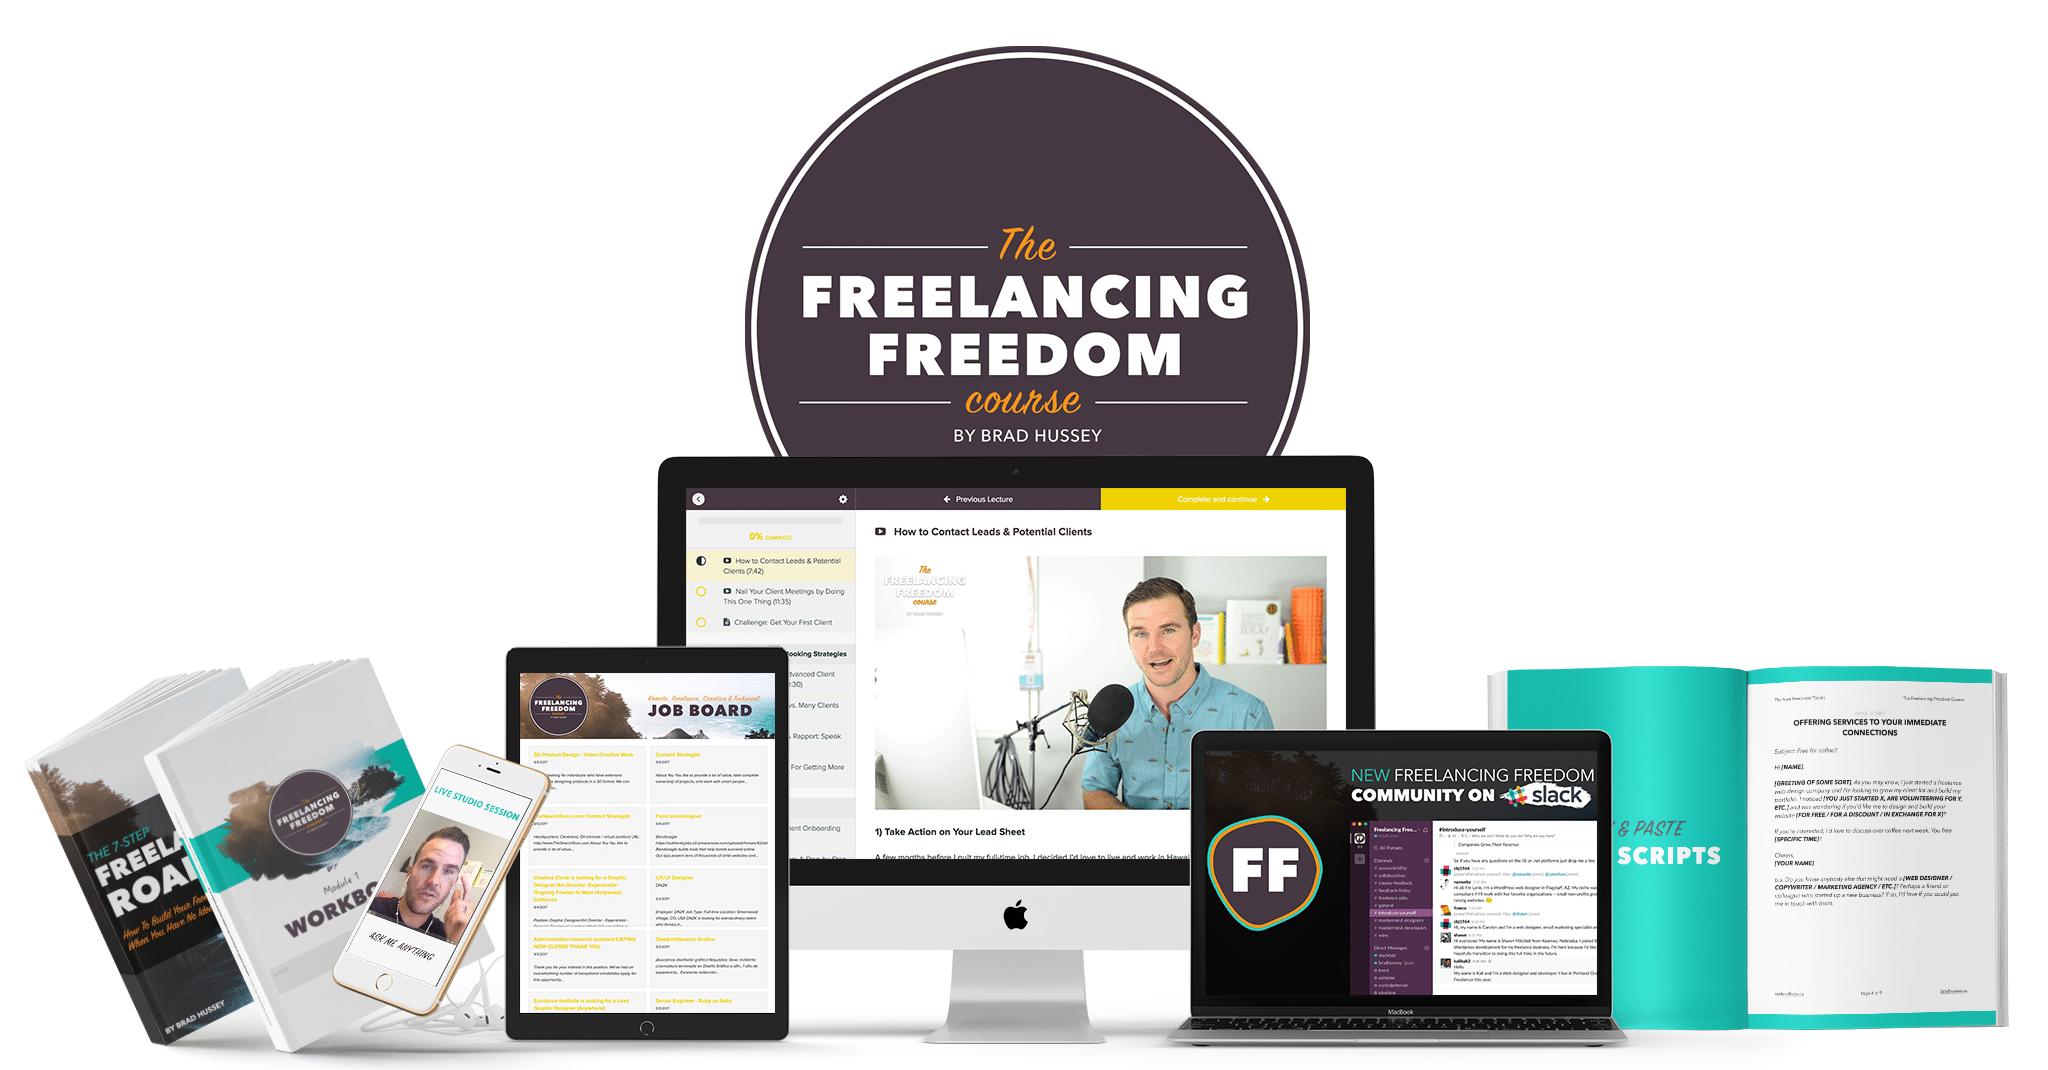 Freelancing Freedom 2017